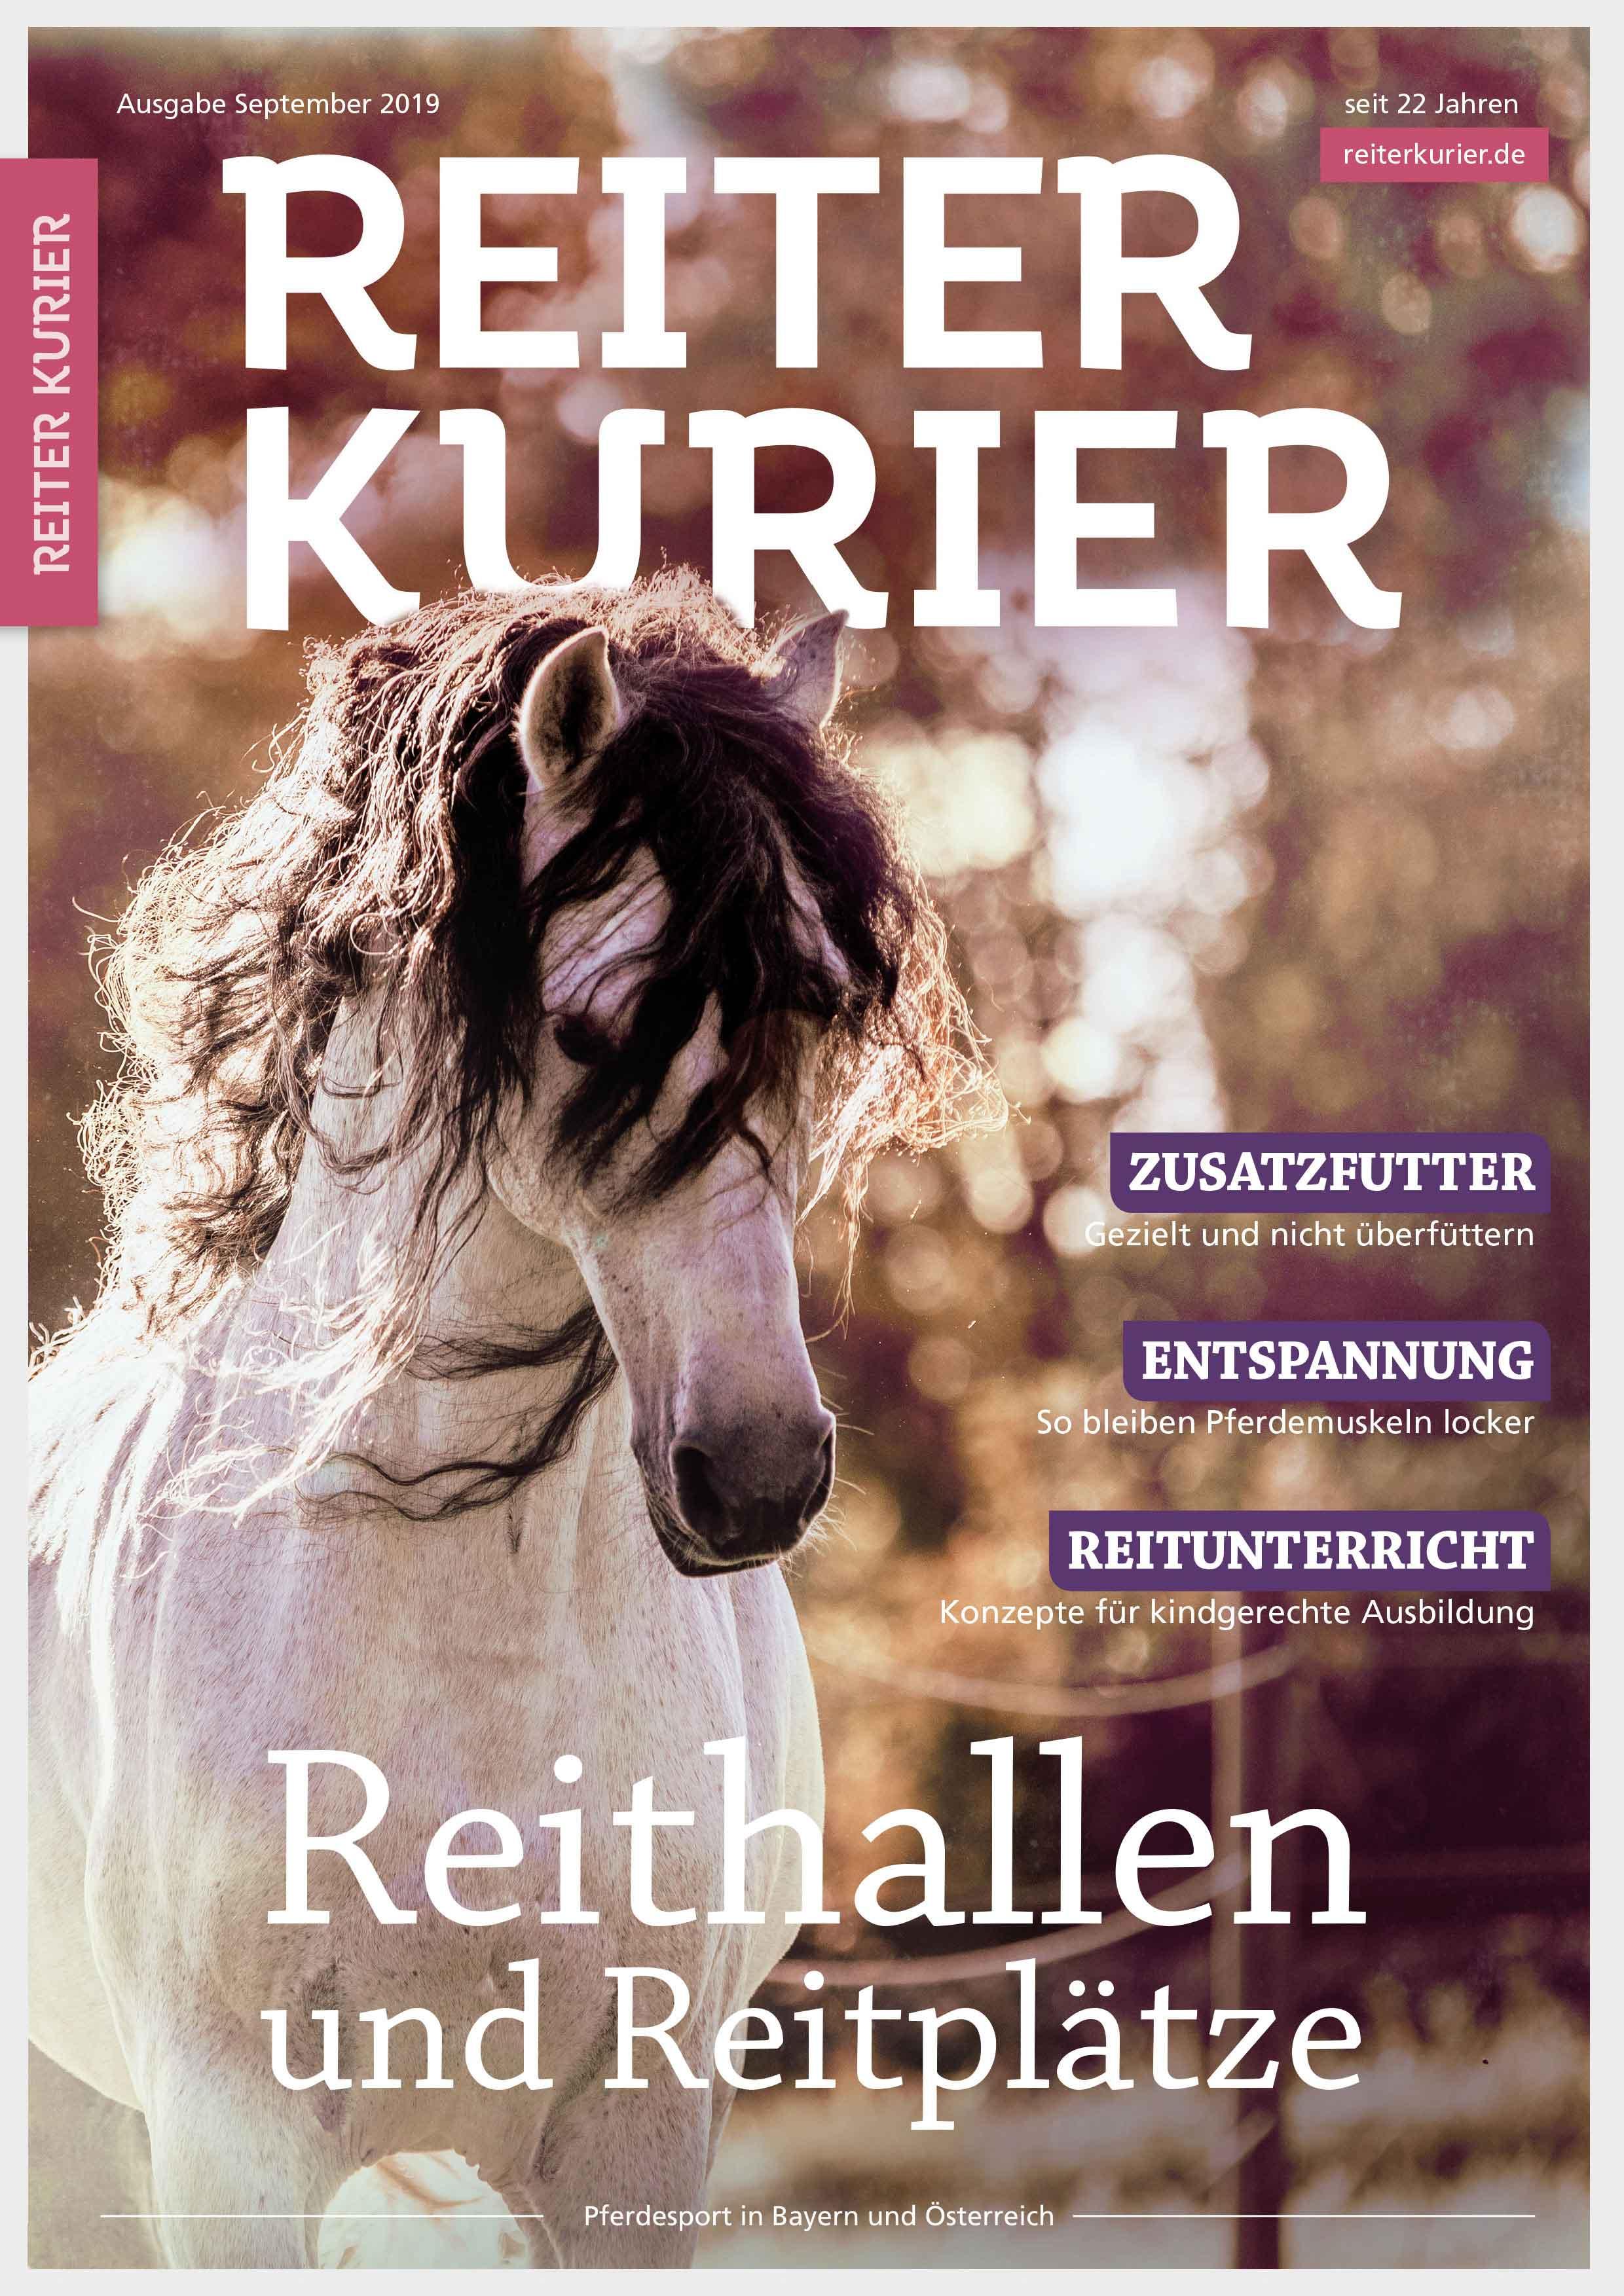 Septermber 2019 Reiter-Kurier Reithallen und Reitplätze